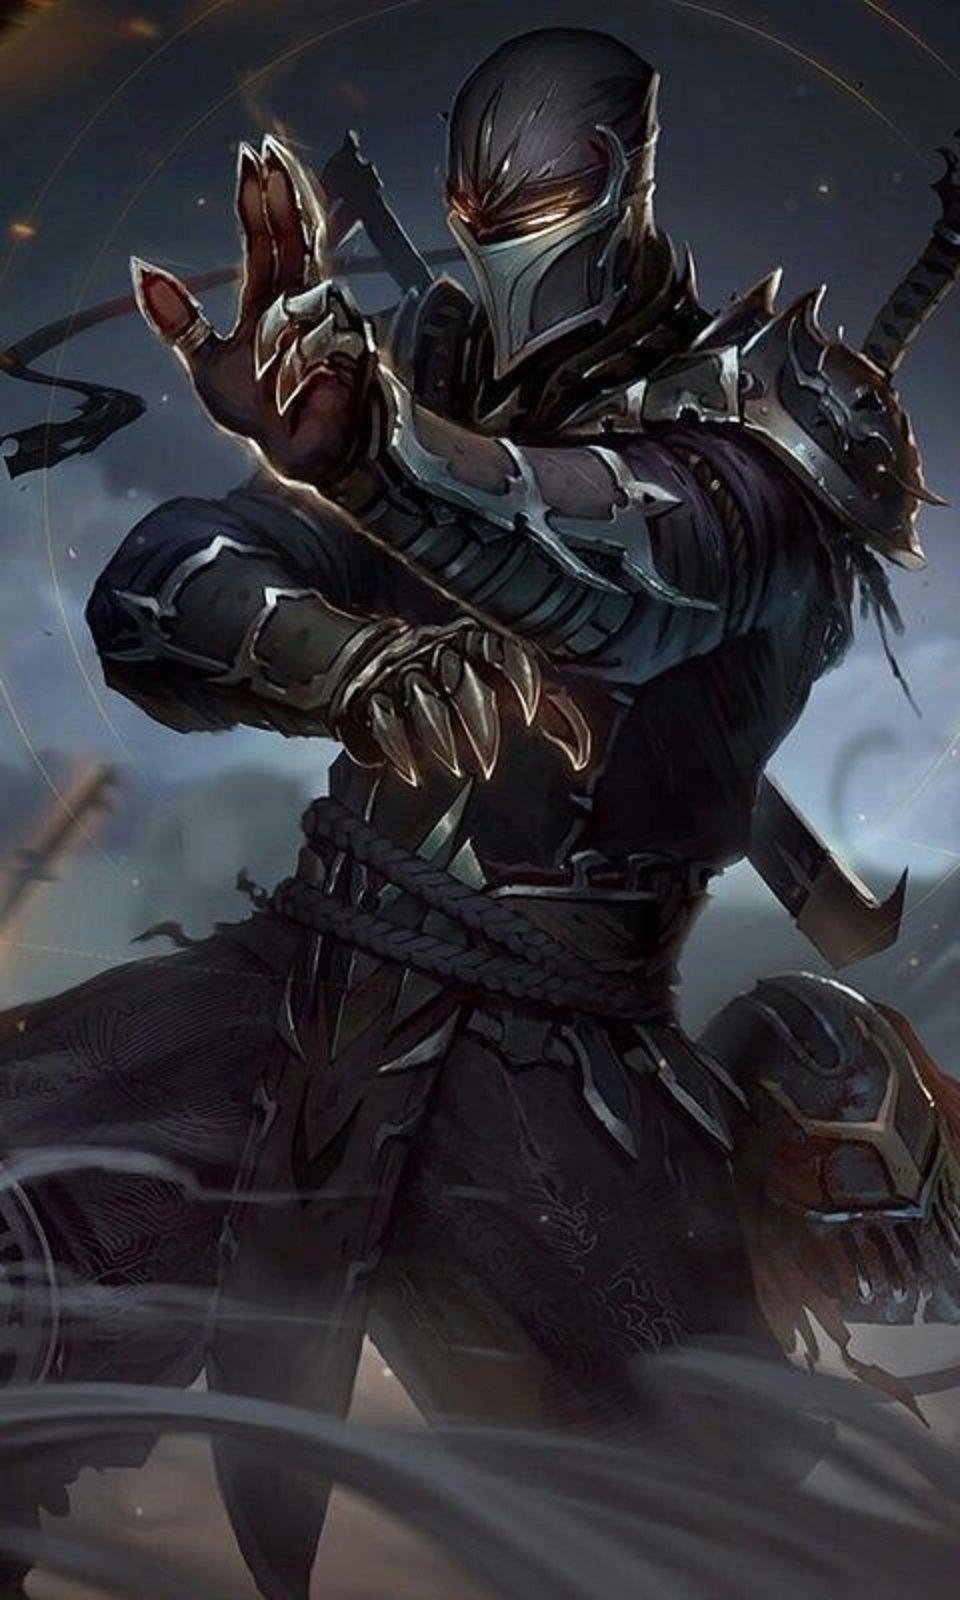 Shadow Ninja in 2020 | Ninja art, Mortal kombat art ...